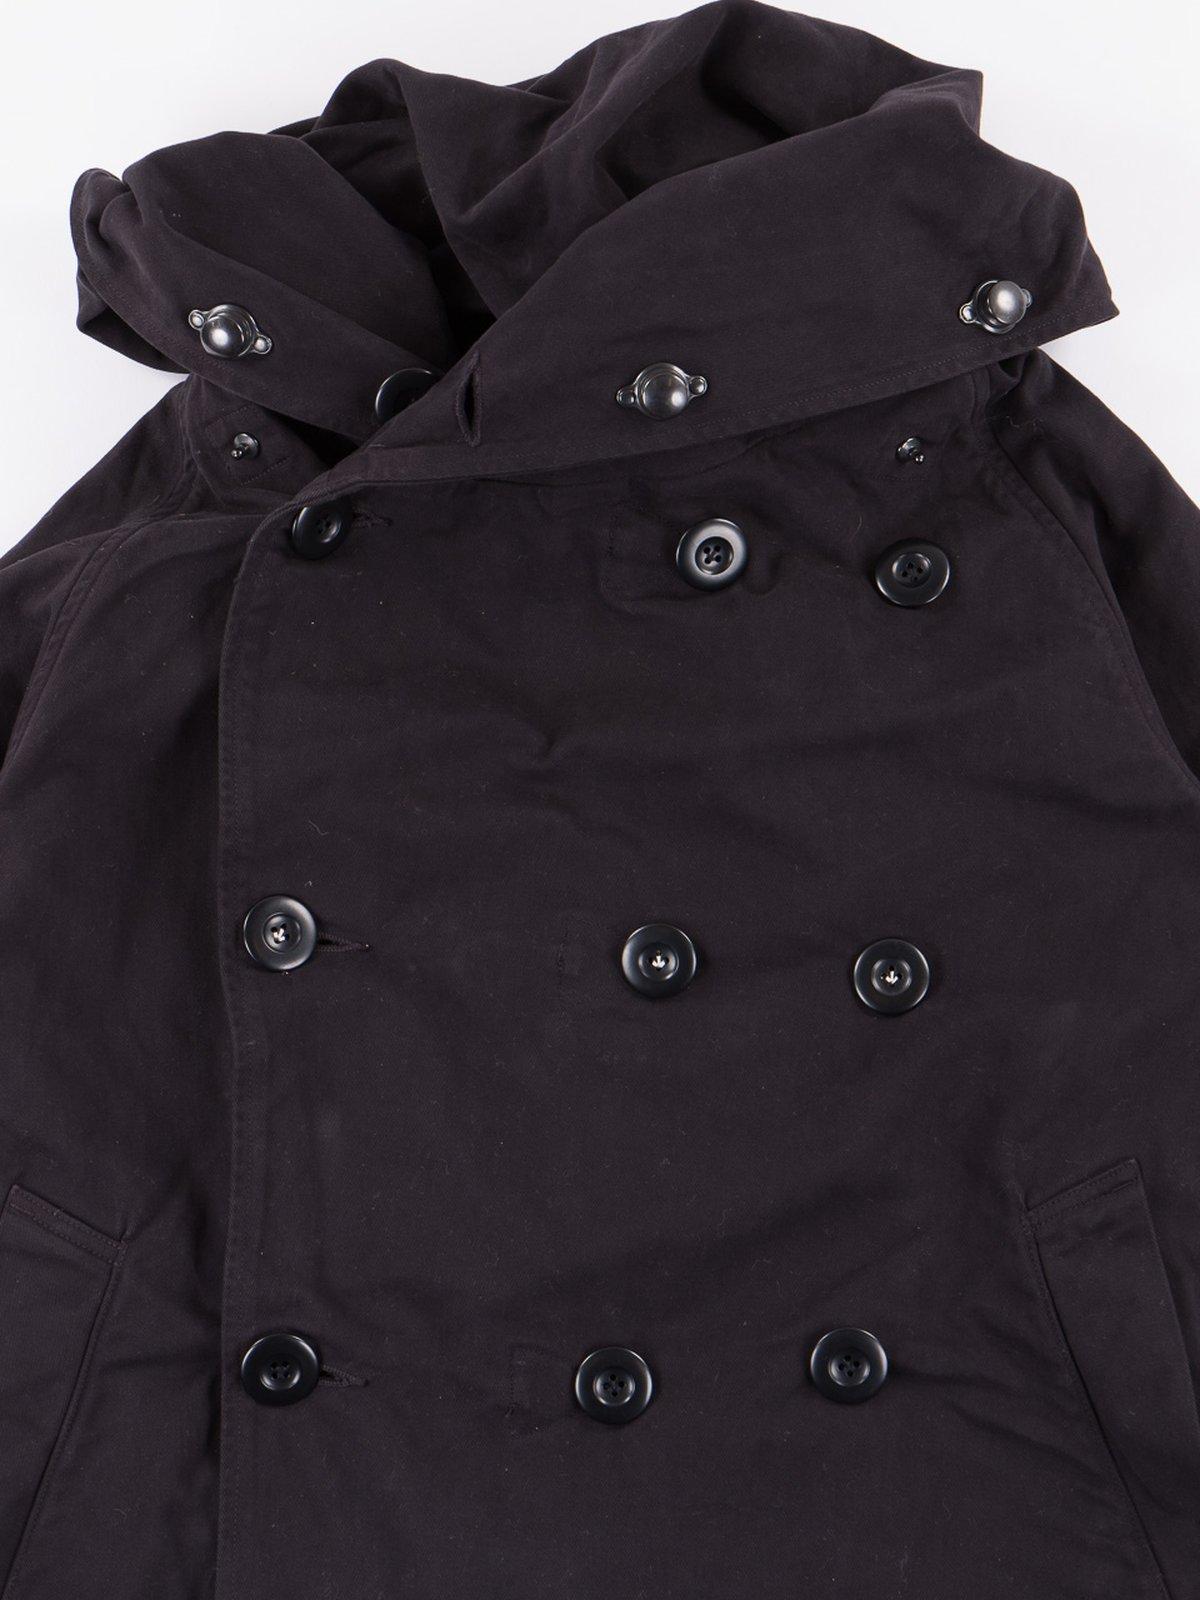 Black Brushed Twill Tri–P Ring Coat - Image 2